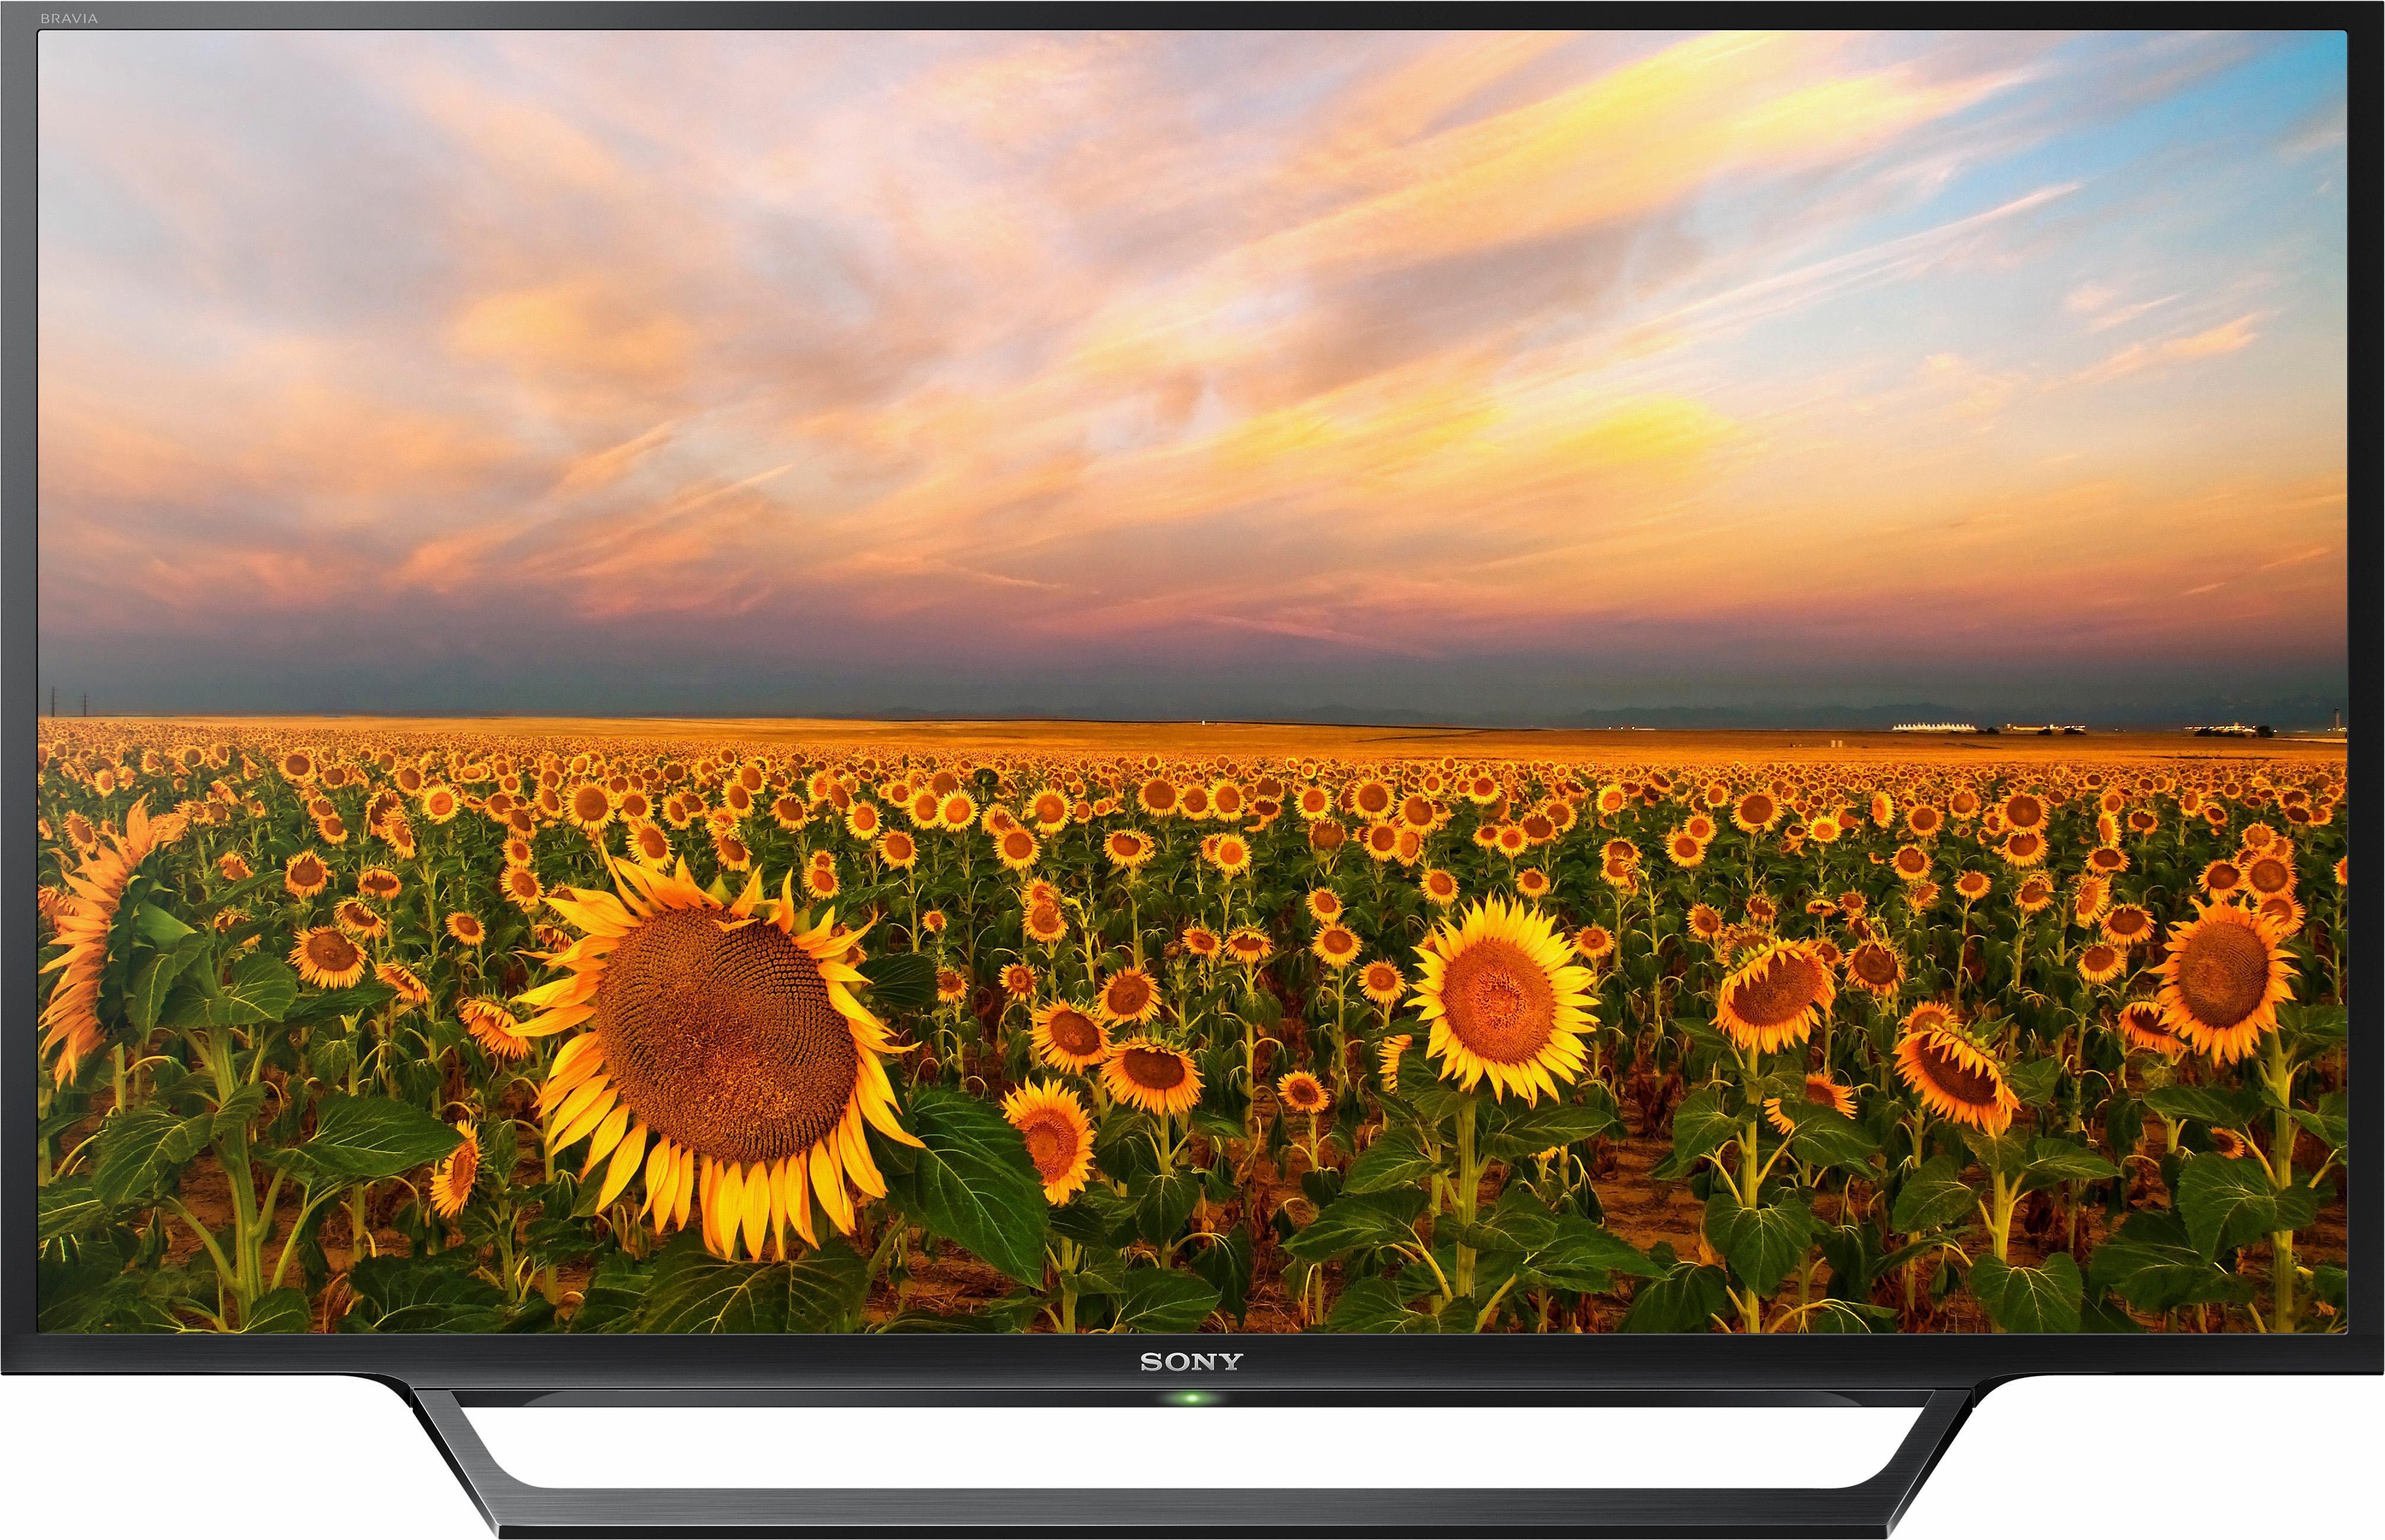 Sony BRAVIA KDL-40RD455, LED Fernseher, 102 cm (40 Zoll), 1080p (Full HD)